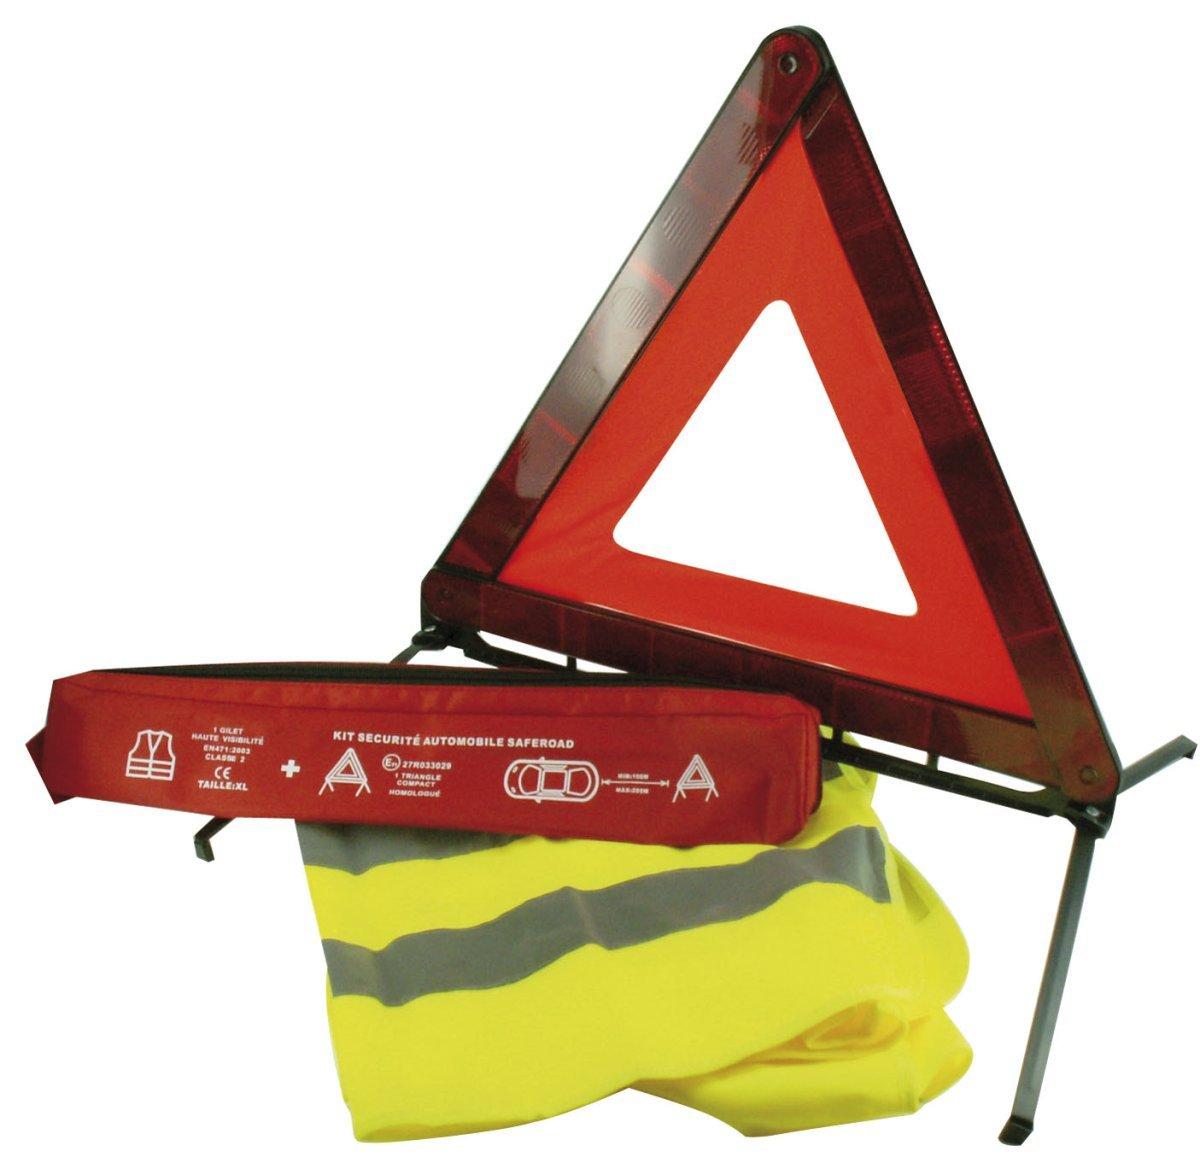 altium 954400 kit triangle gilet homologue eur 16 32 picclick fr. Black Bedroom Furniture Sets. Home Design Ideas